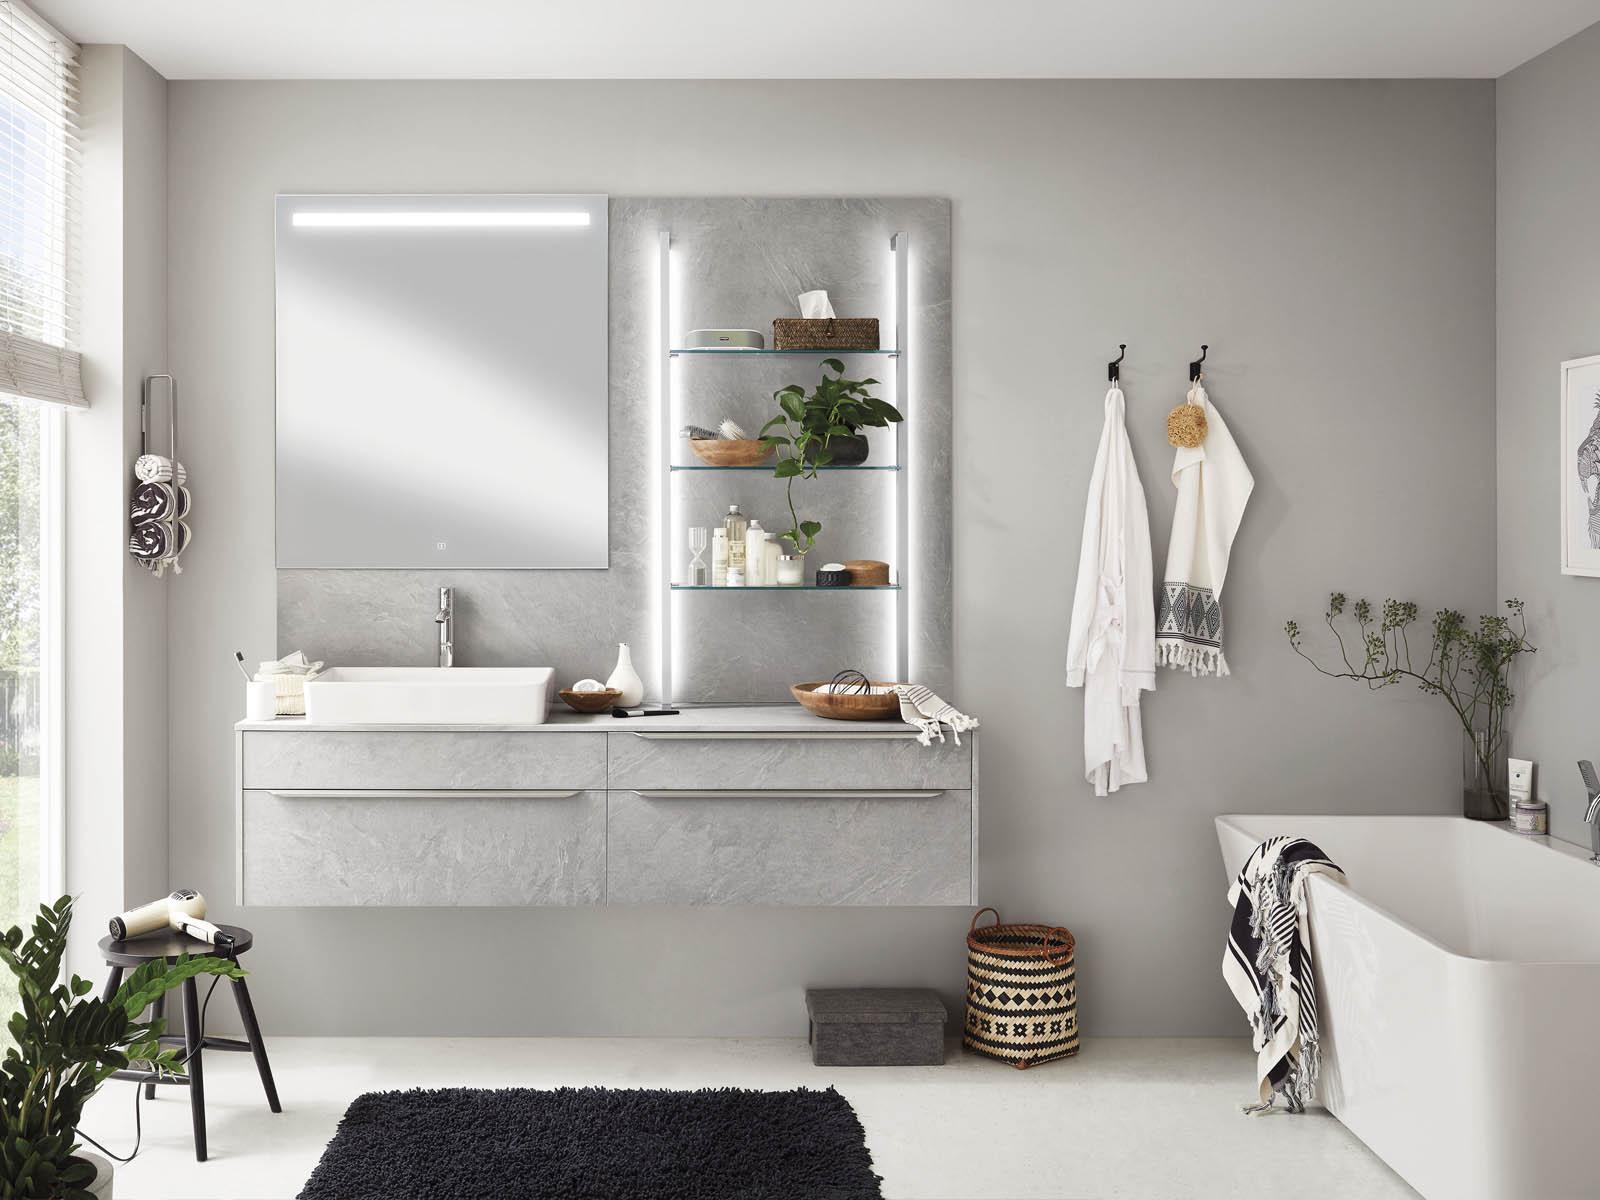 Küchentime StoneArt 304 - Bathroom